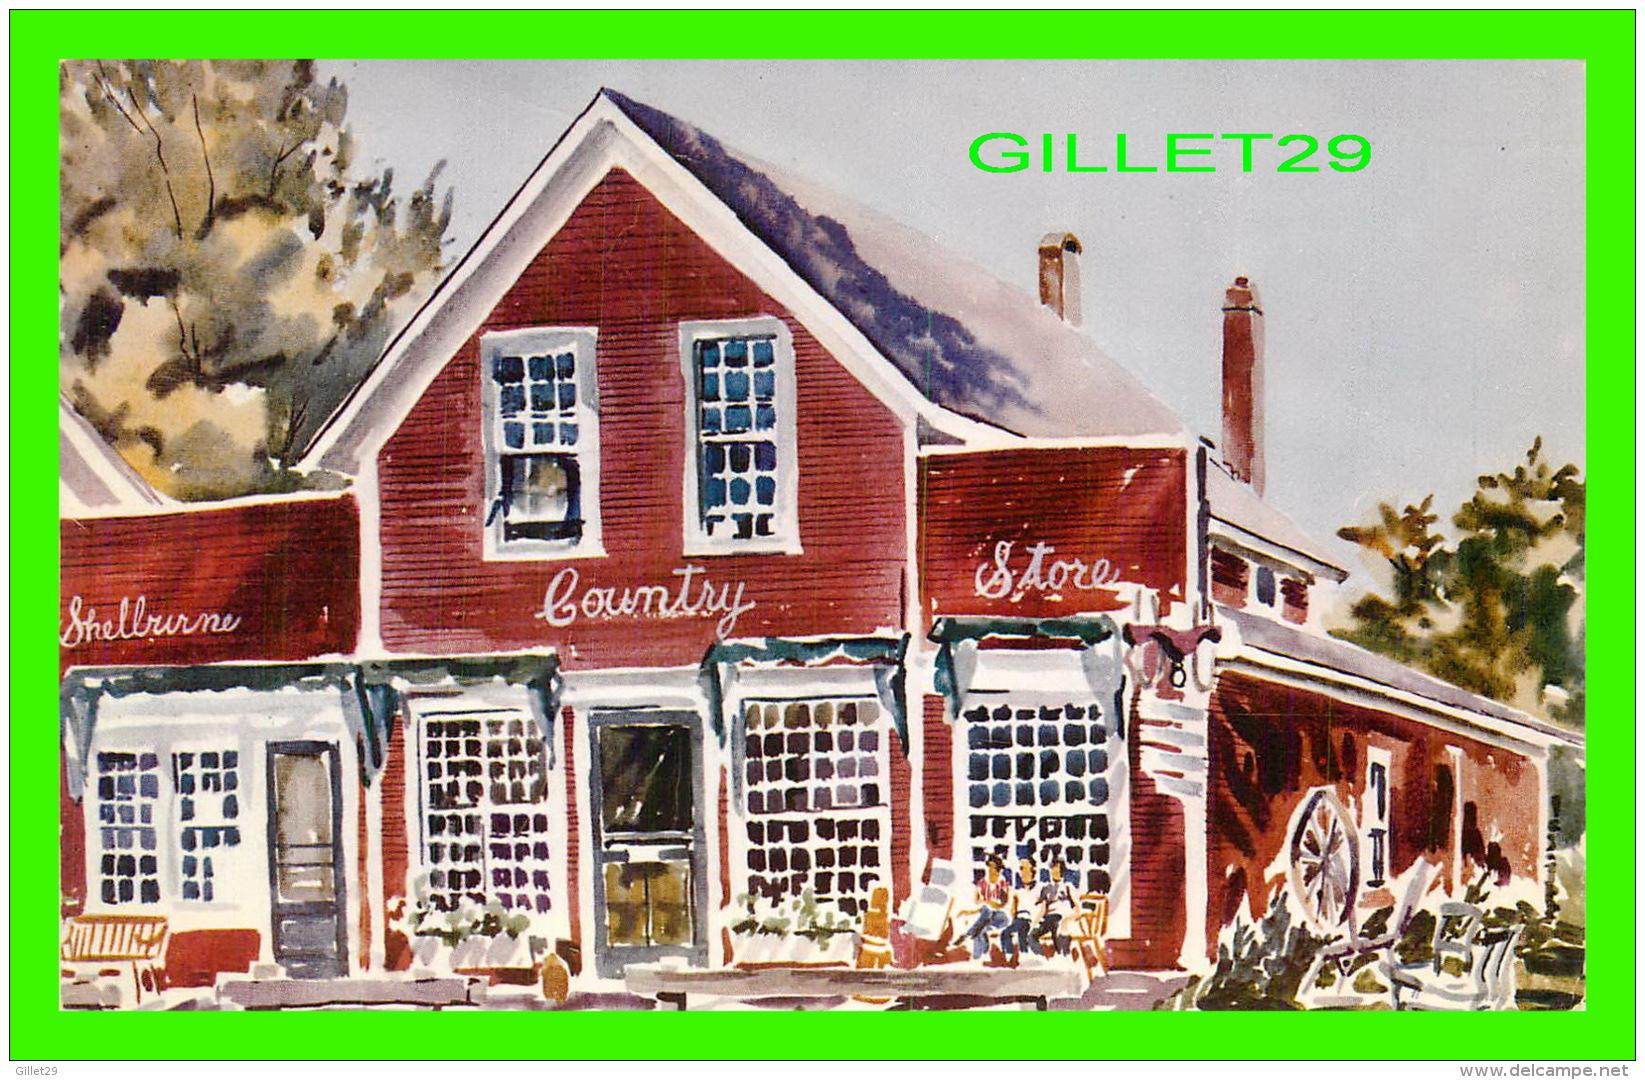 SHELBURNE, VT - SHELBURNE COUNTRY STORE ON THE VILLAGE GREEN SHELBURNE - TRAVEL IN 1966 - - United States